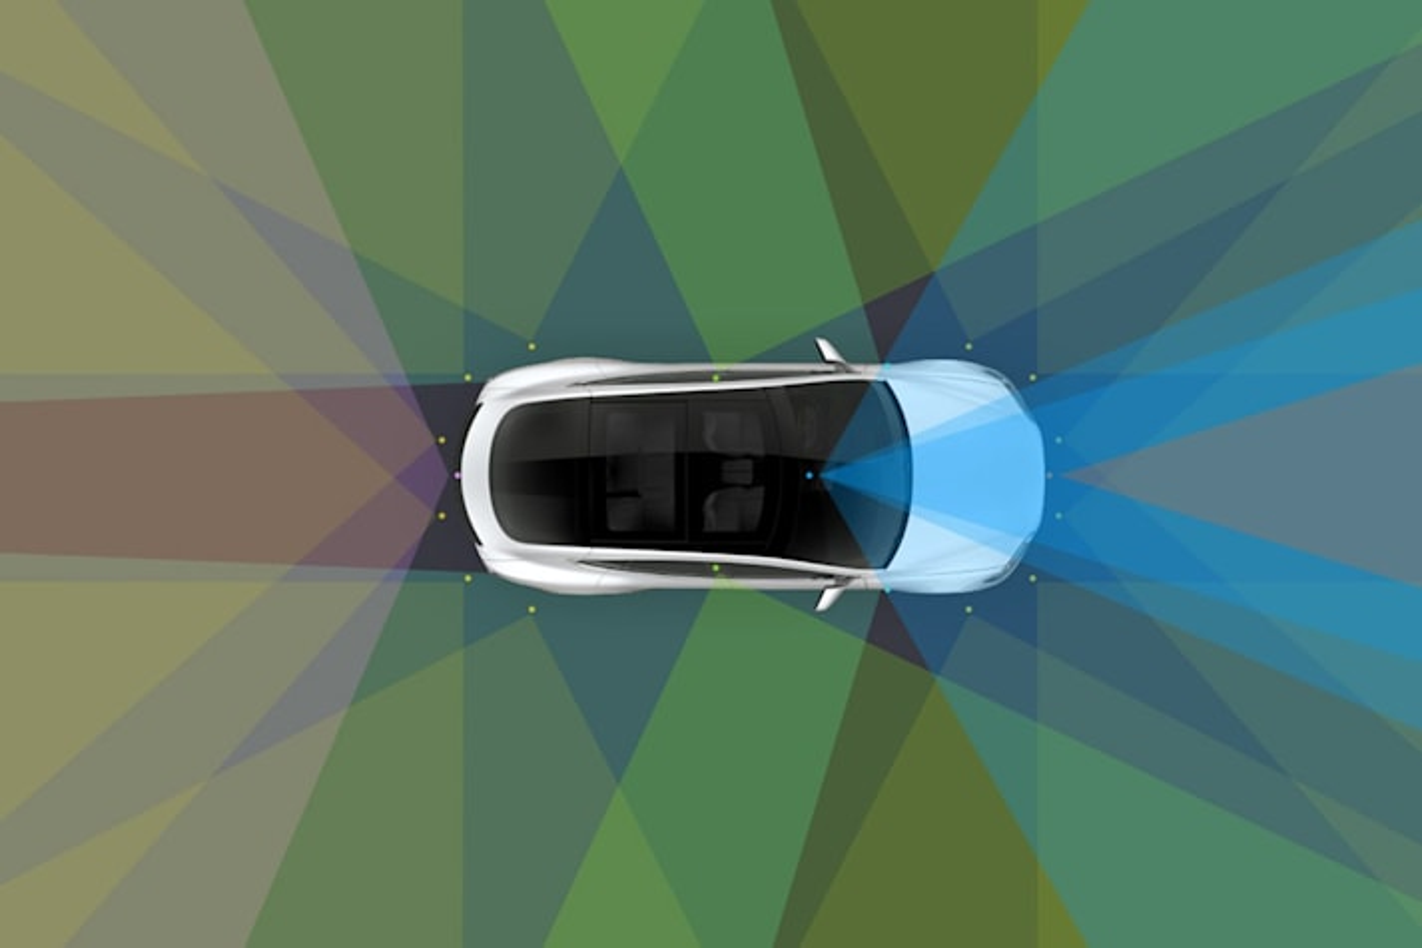 Tesla on Autopilot